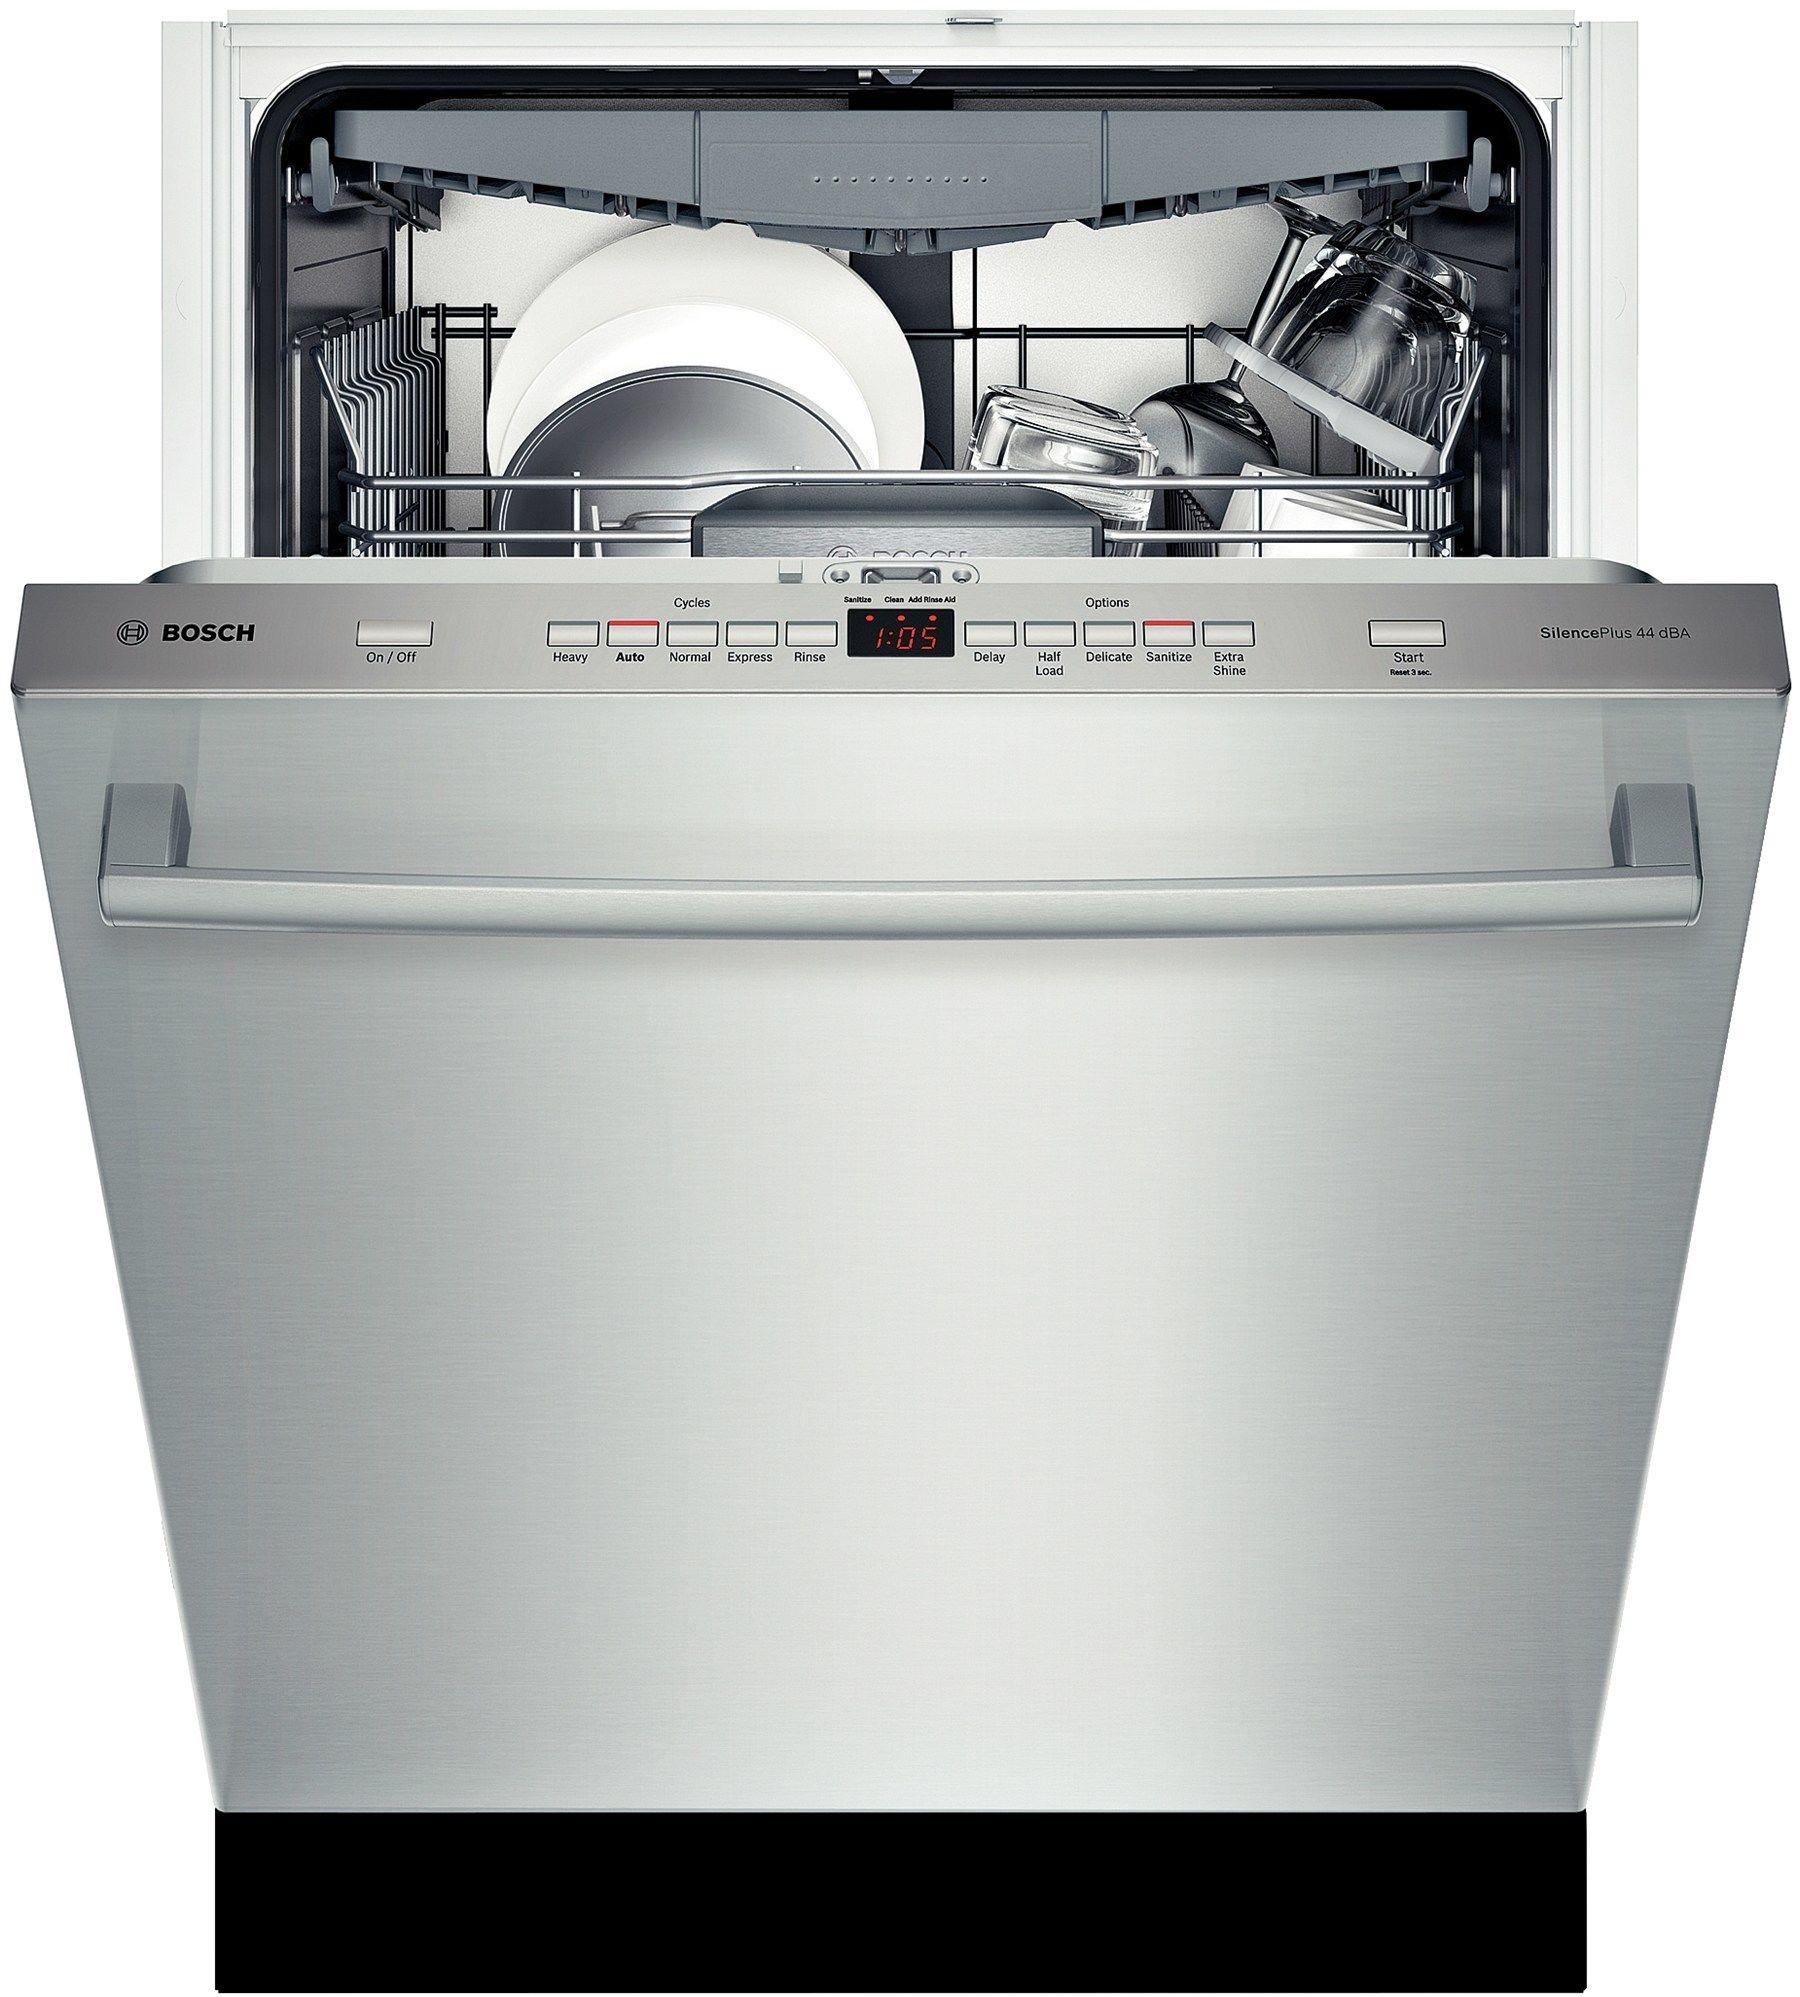 Bosch Kitchen Appliances Packages Bosch Shx65t55uc Buildcom